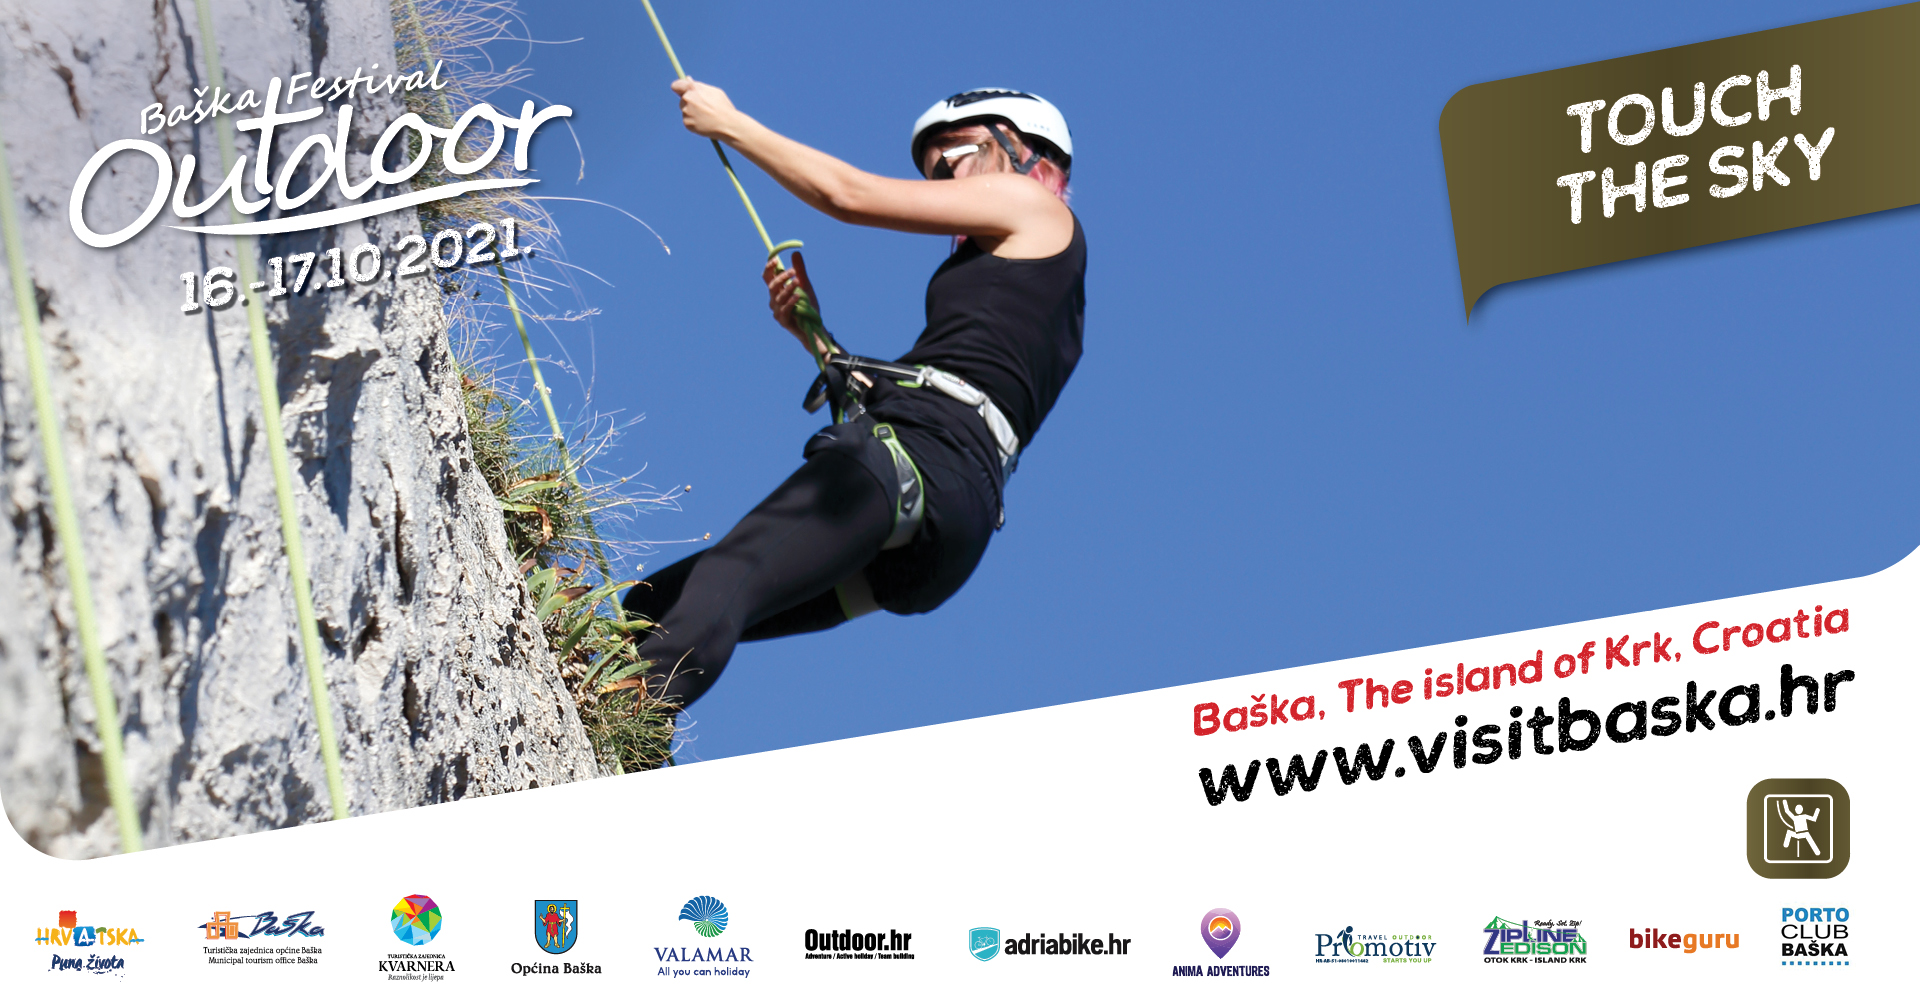 facebook_event Baska Outdoor 1920x1005 pix_climb.jpg